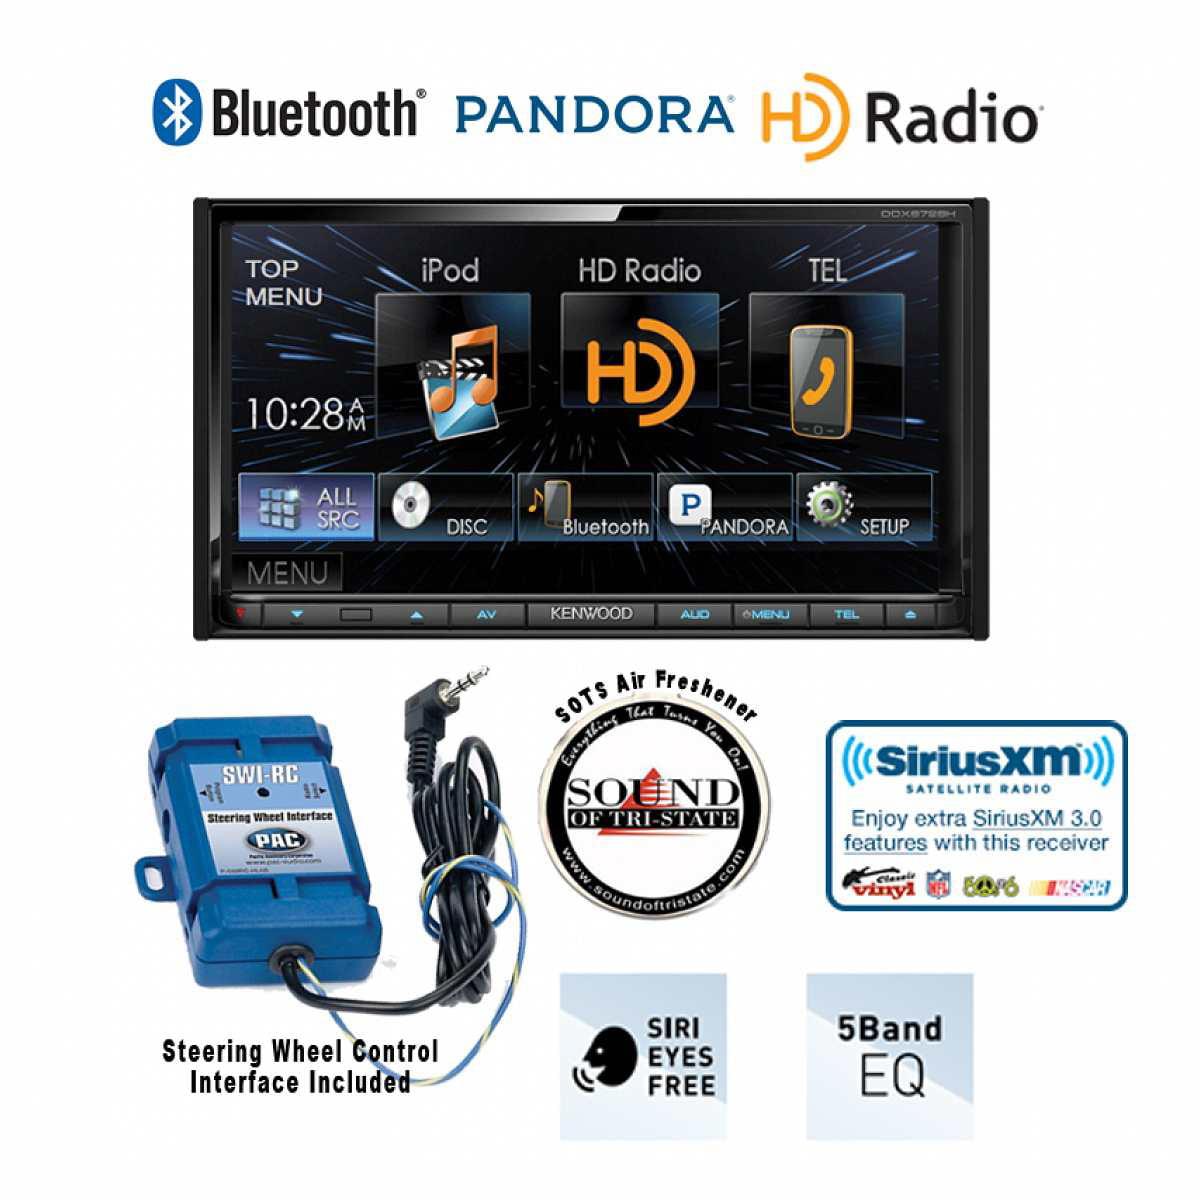 Kenwood DDX672BH Bluetooth Receiver  w/ PAC SWI-RC Steering Wheel Control Interface